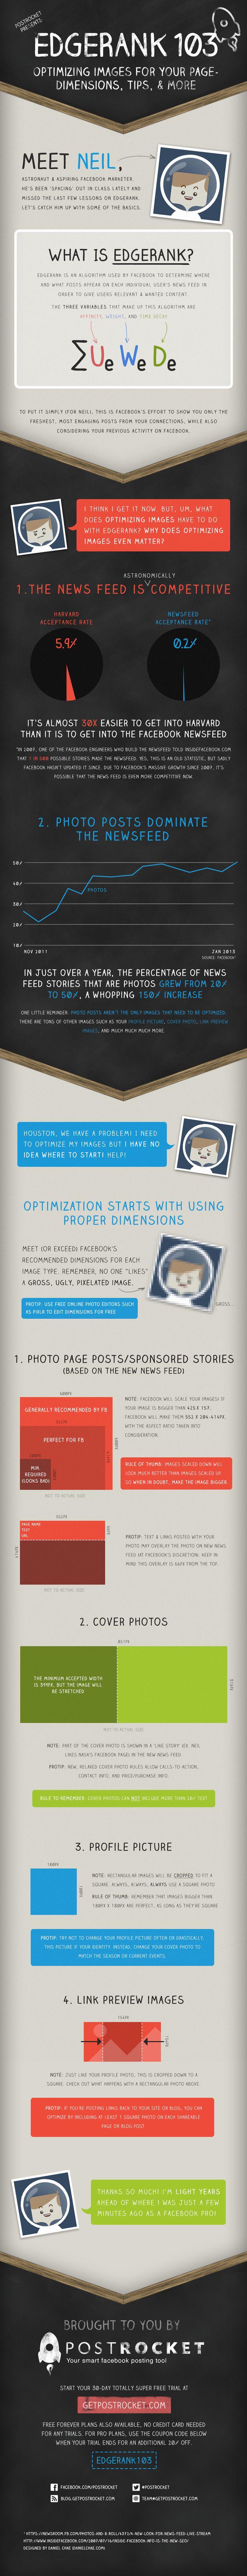 Facebook EdgeRank 103 – Optimizing Images for Your Facebook Page | PostRocket Blog [Infographic]  #facebook #edgerank